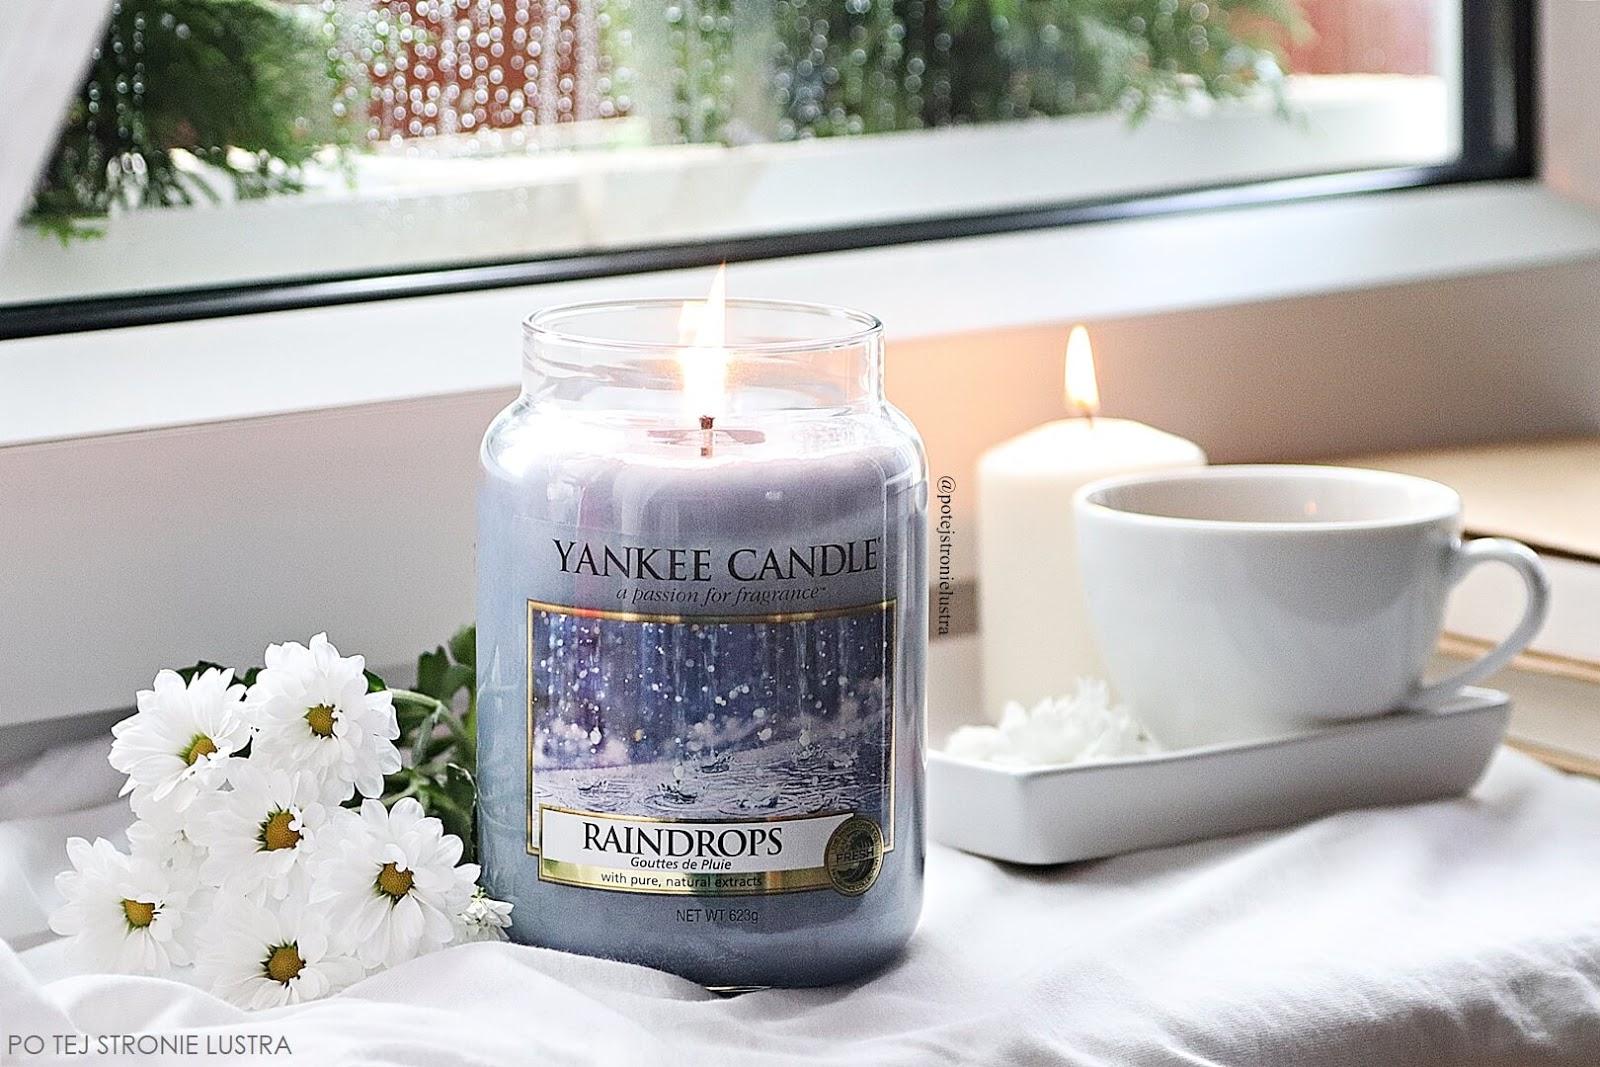 Yankee Candle Raindrops